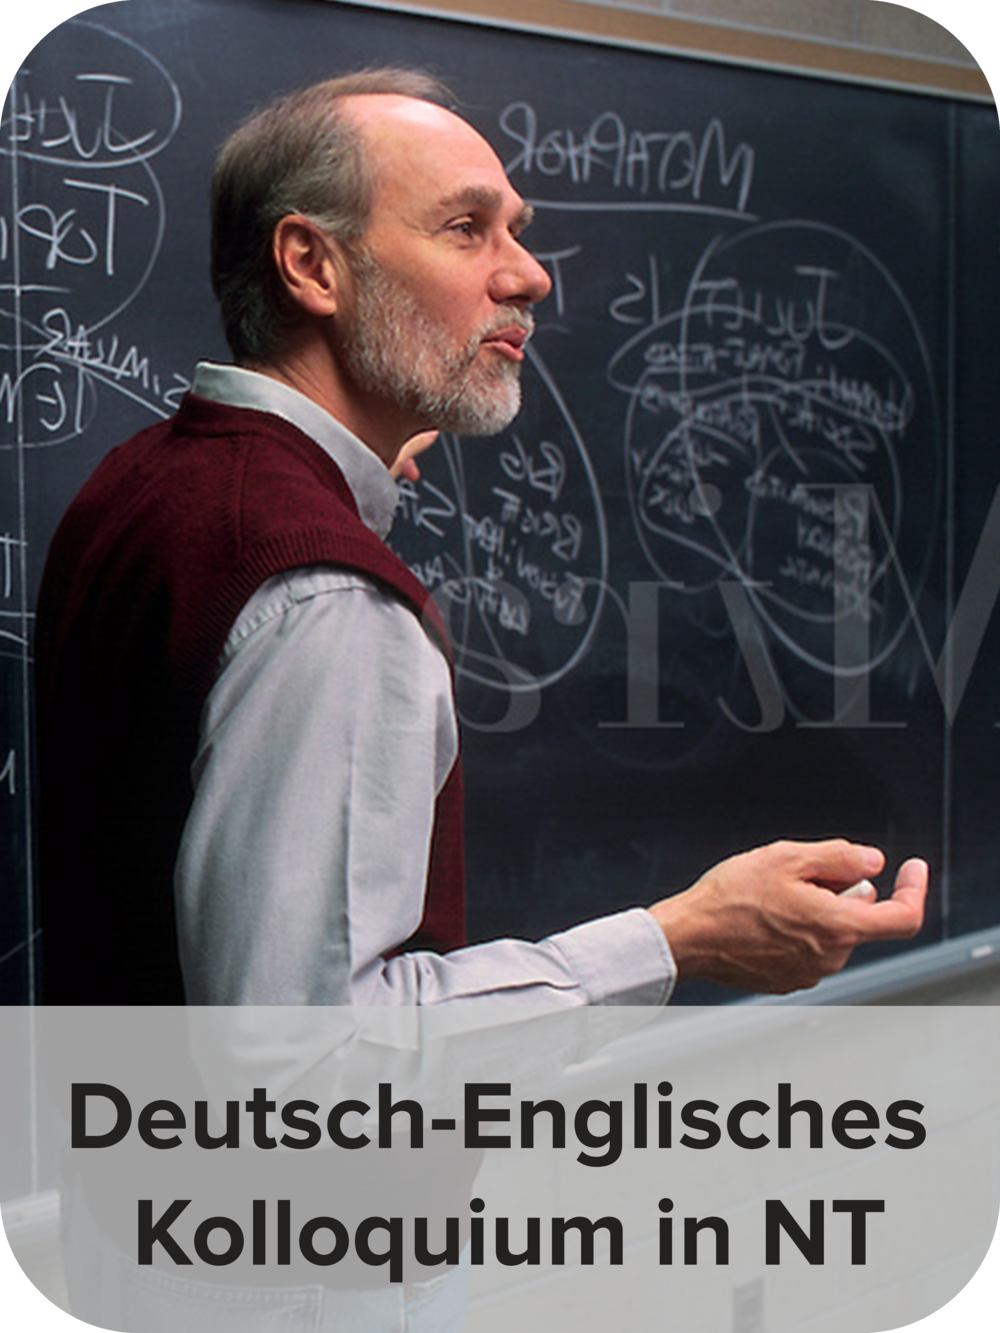 Deutsch-Englisches Kolloquium in NT.png